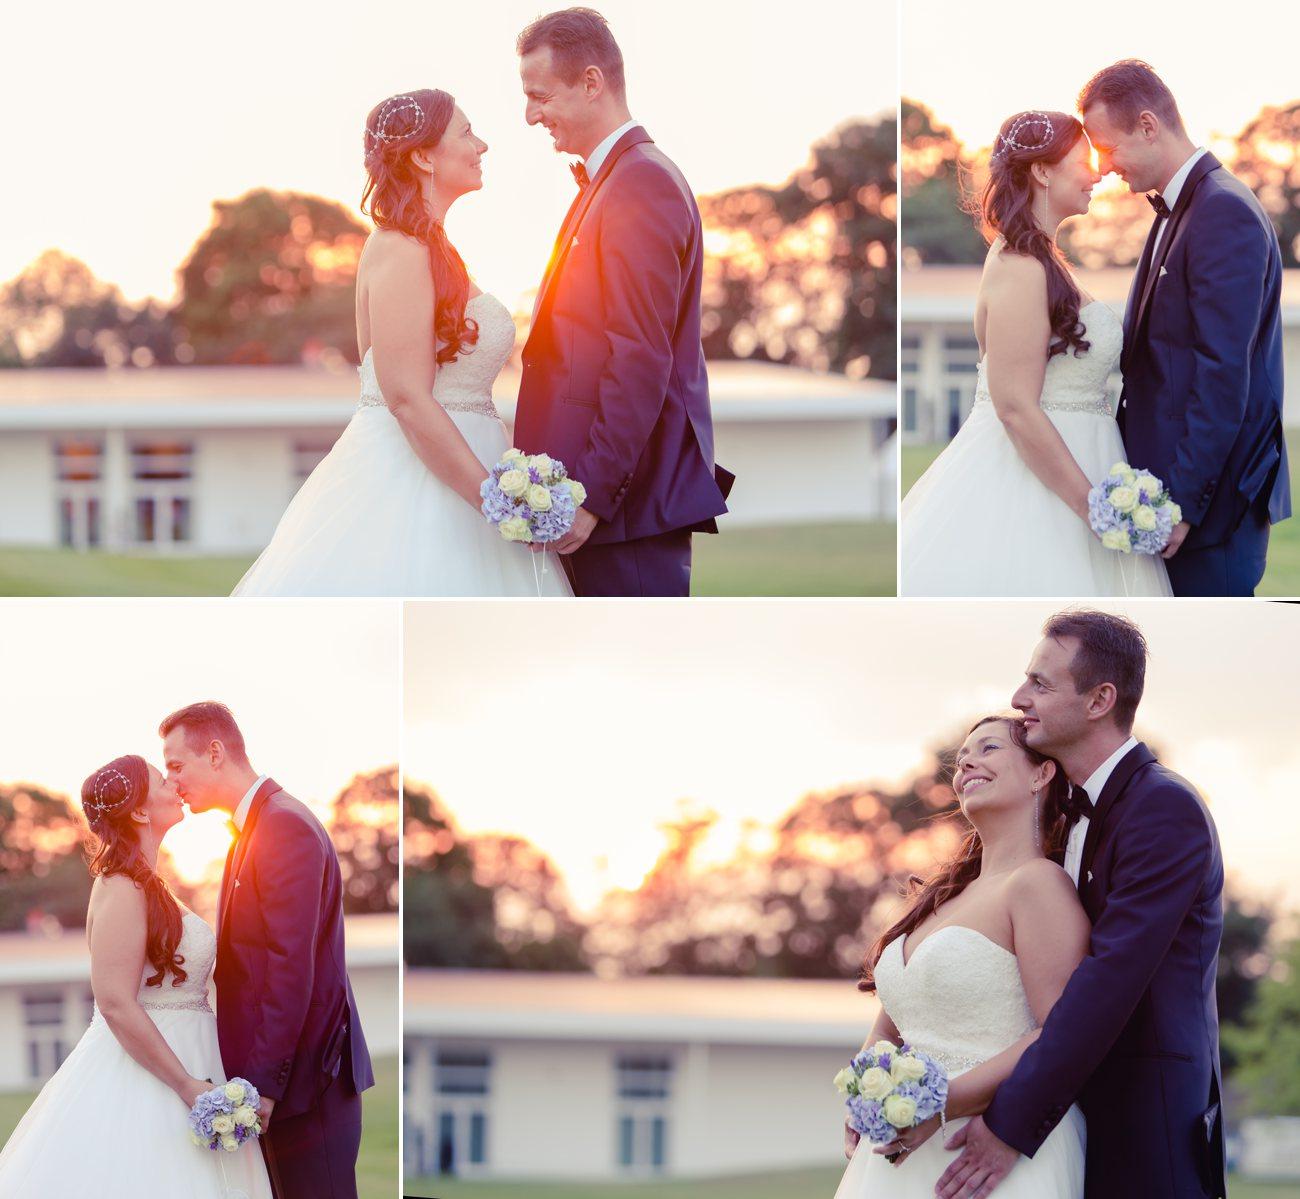 Hochzeitsfotograf_A-Rosa_Scharmuetzelsee089